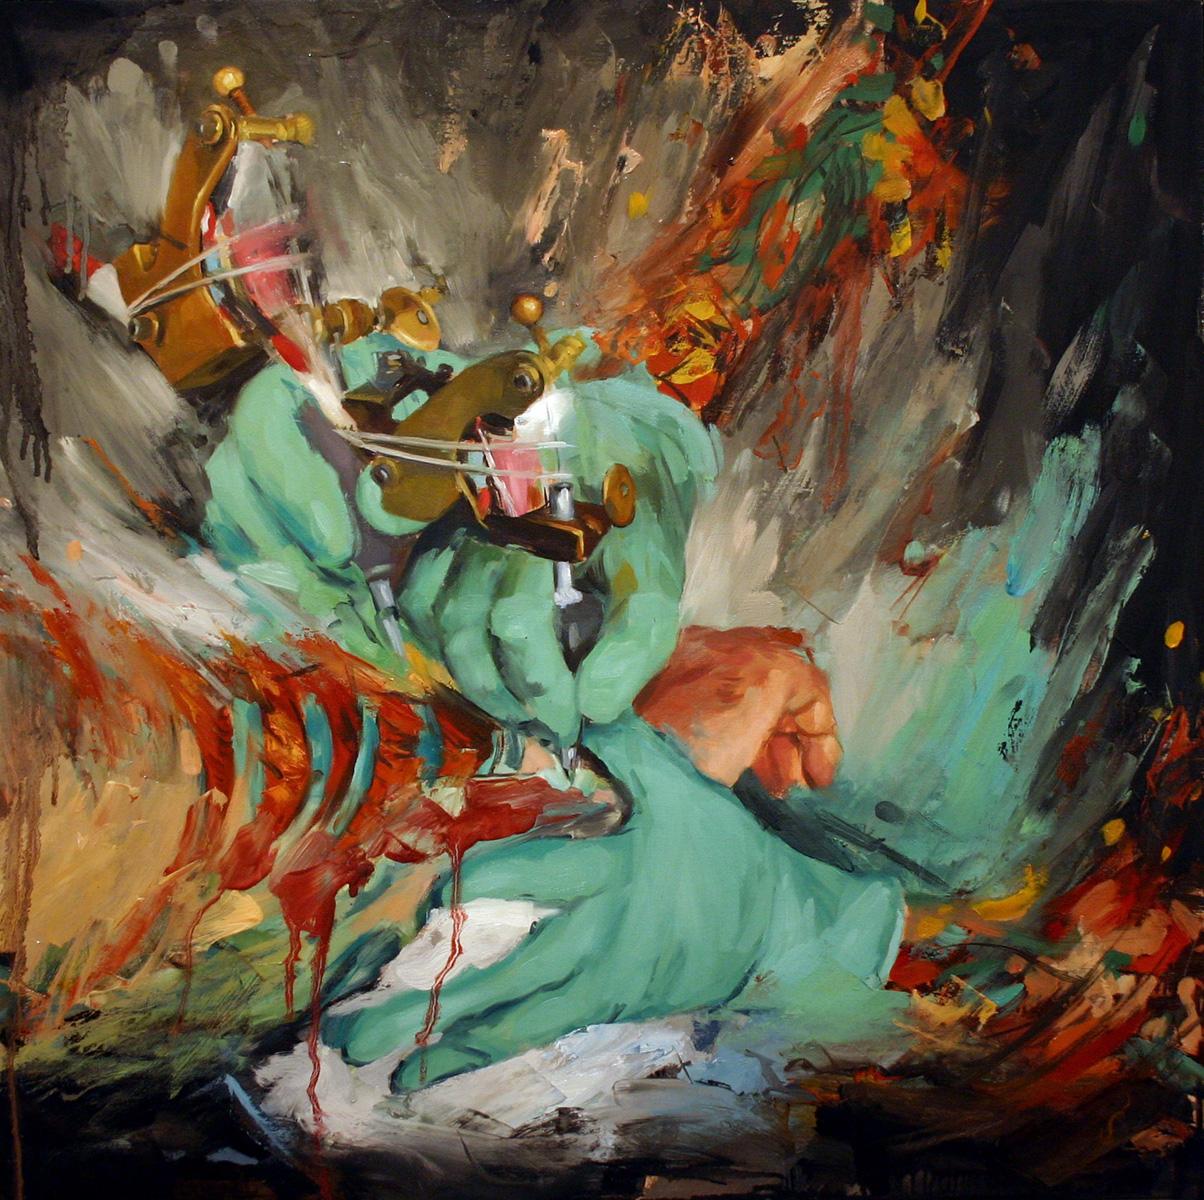 "'The Process (Yutaro Sakai at Work)', oil on panel, 24"" x 24"", 2005, Collection of Jonah Austin"